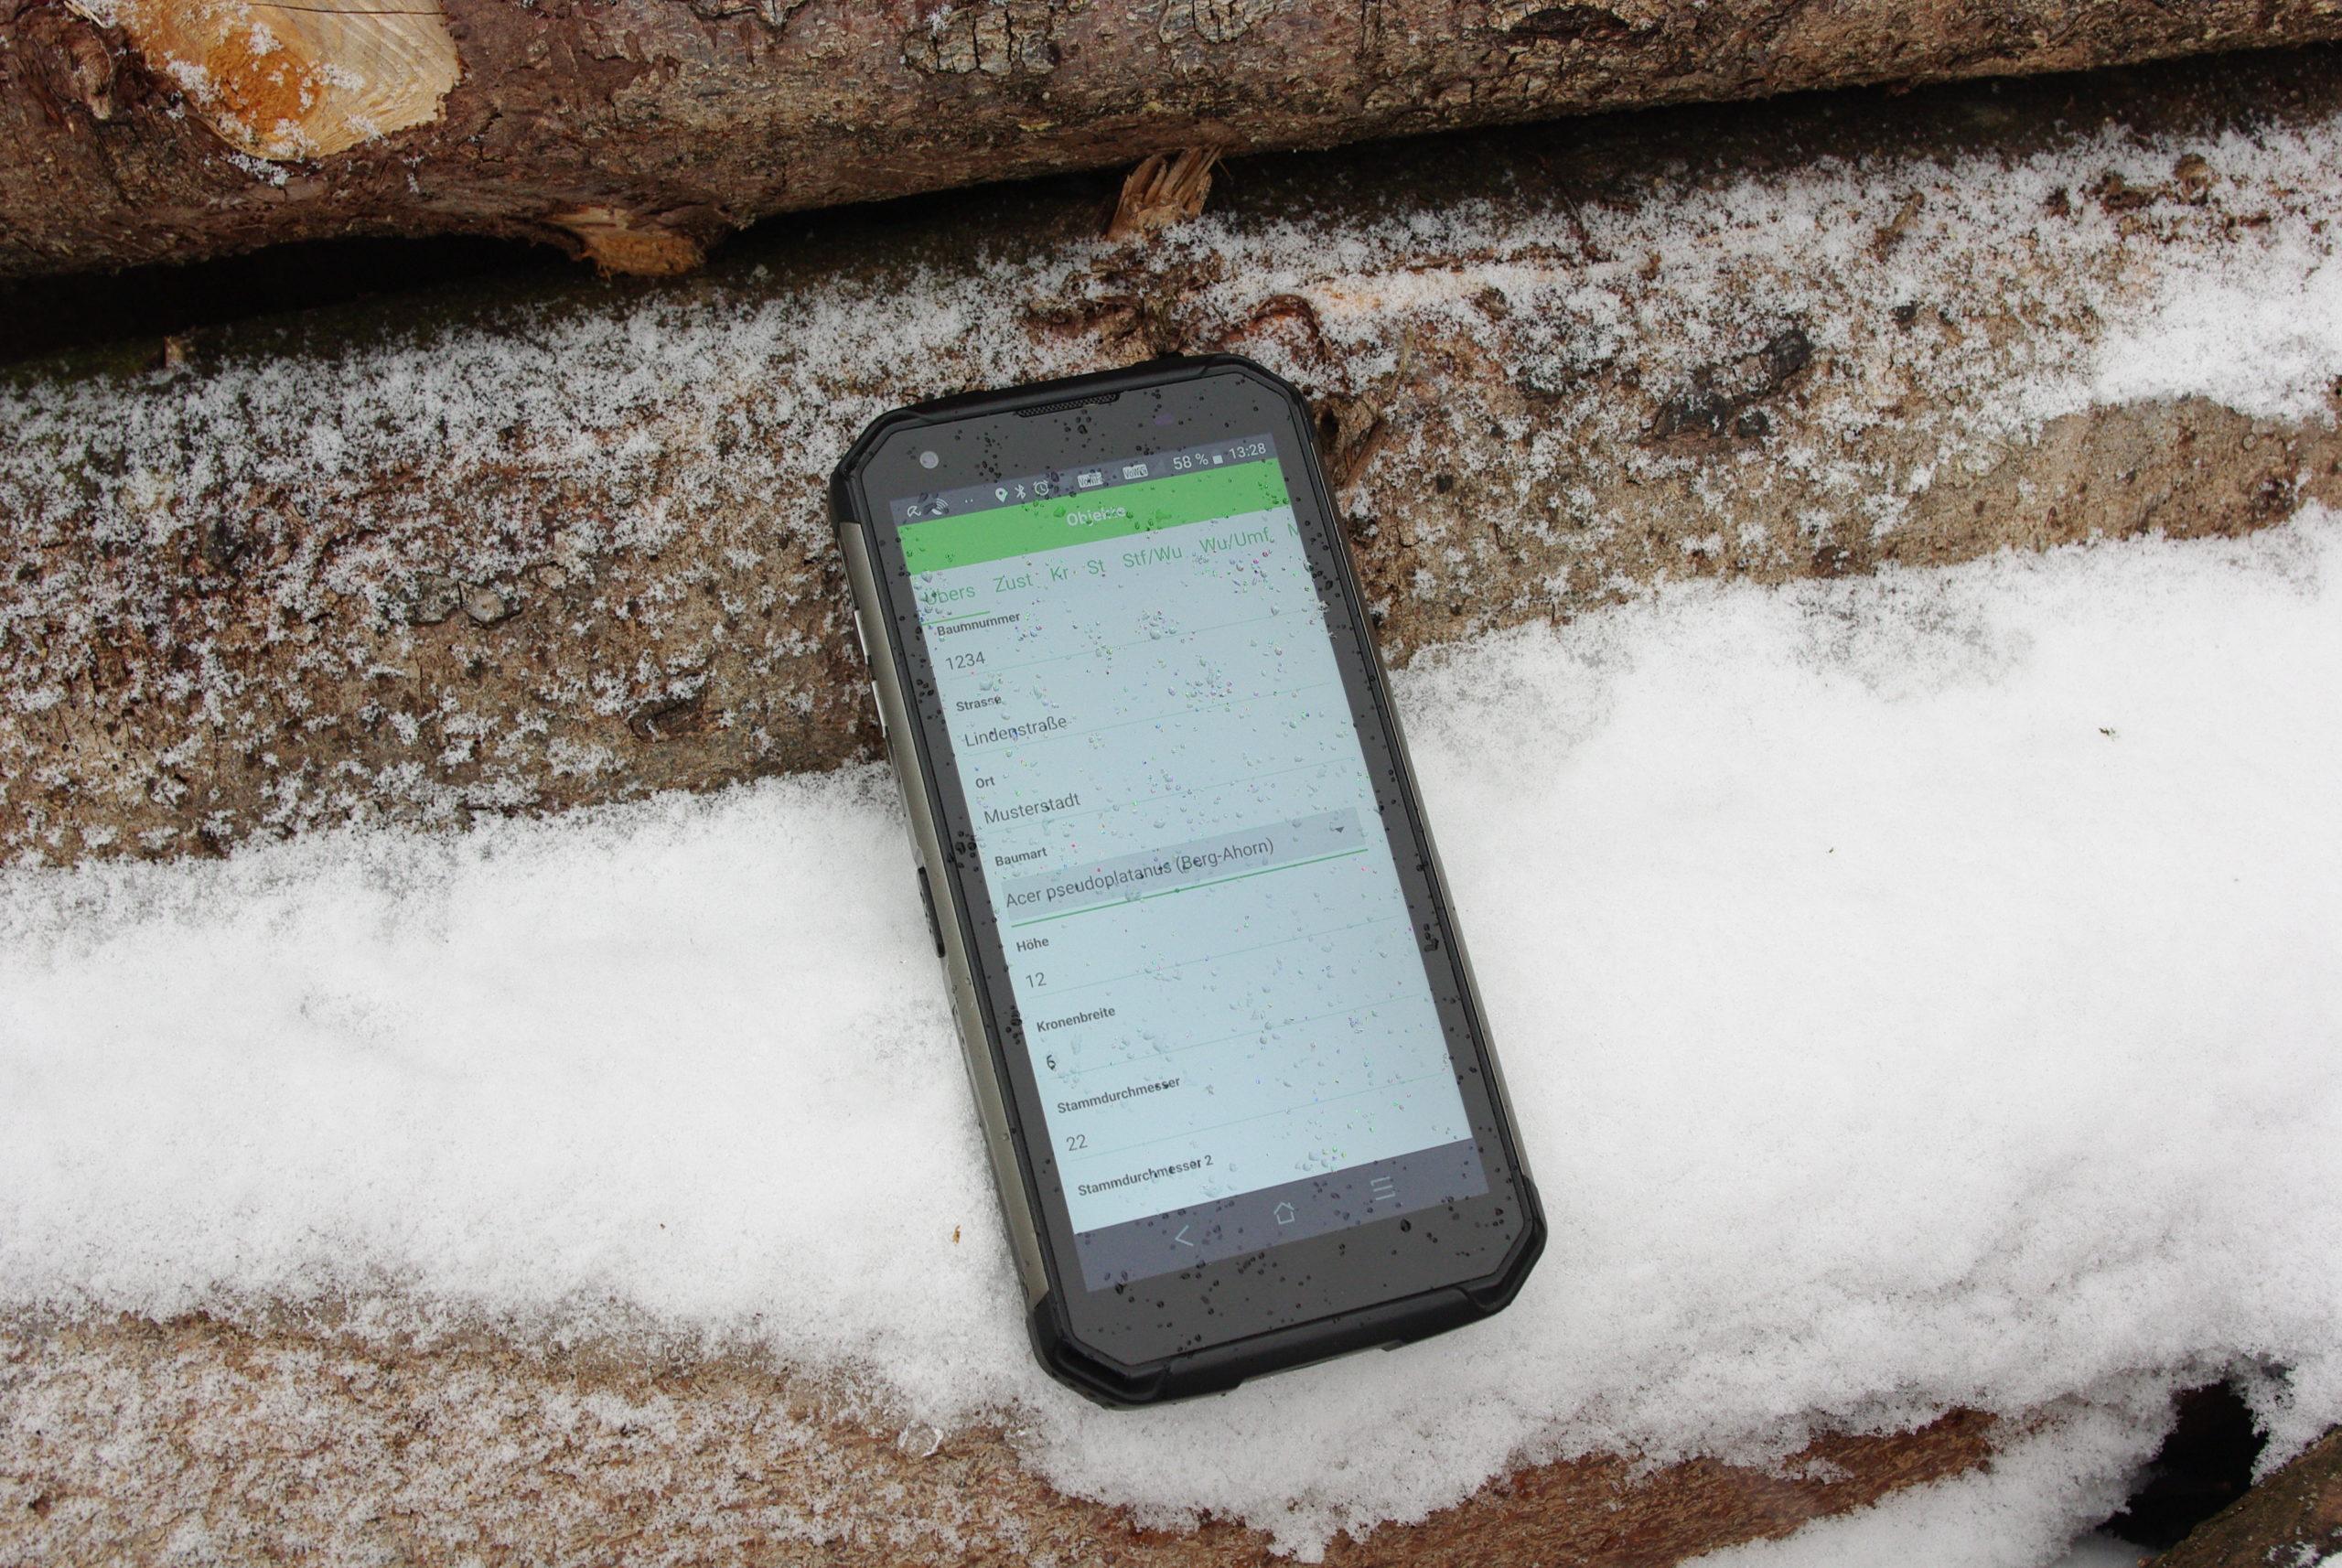 Baumkataster 4 – Baumkontrolle mit App